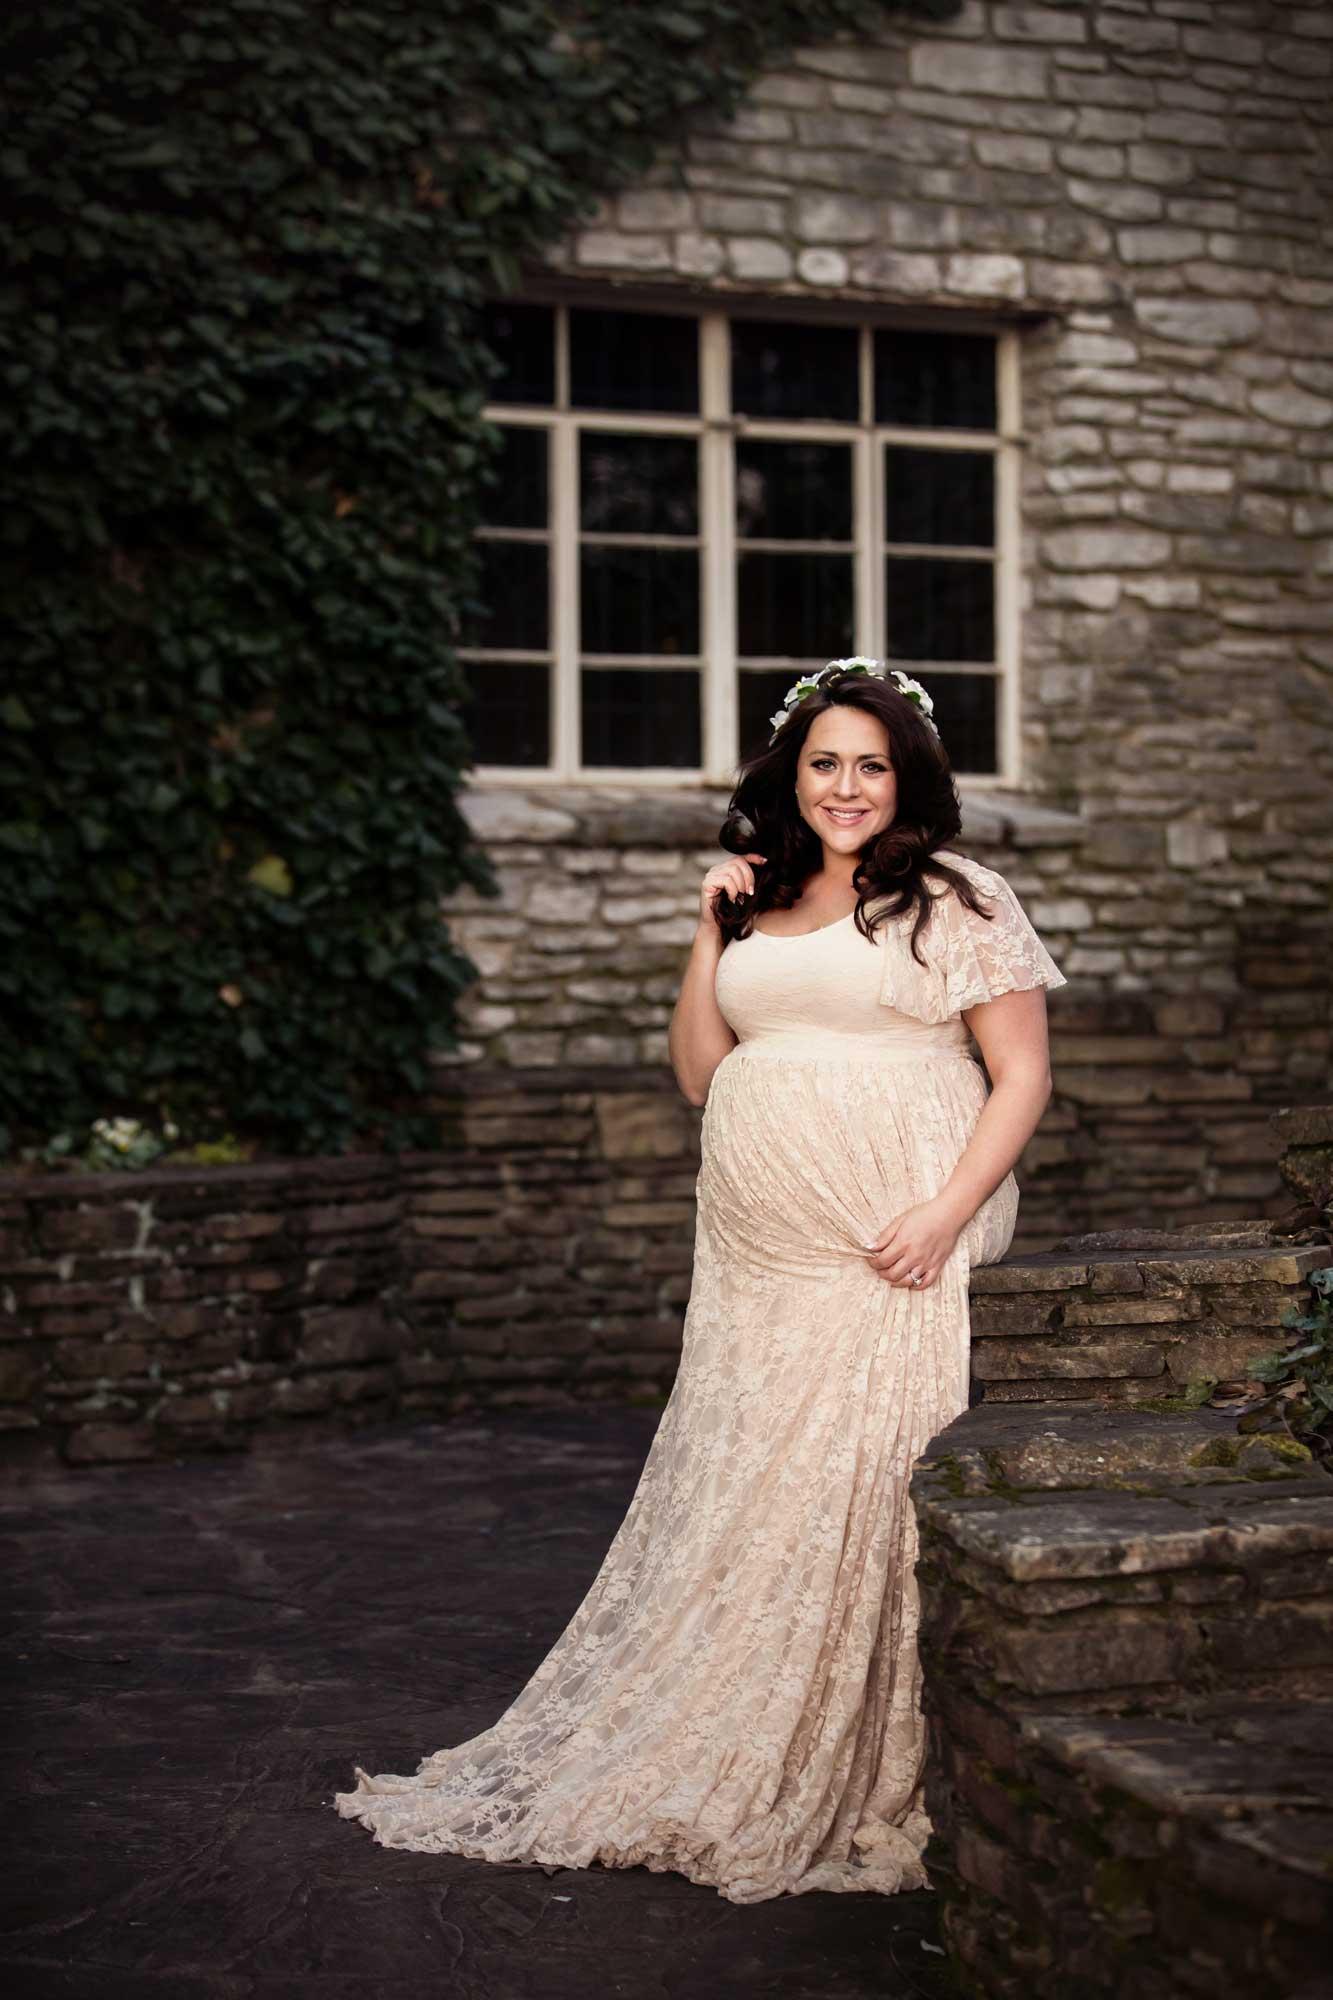 knoxille-botanical-gardens-maternity-photographer.jpg